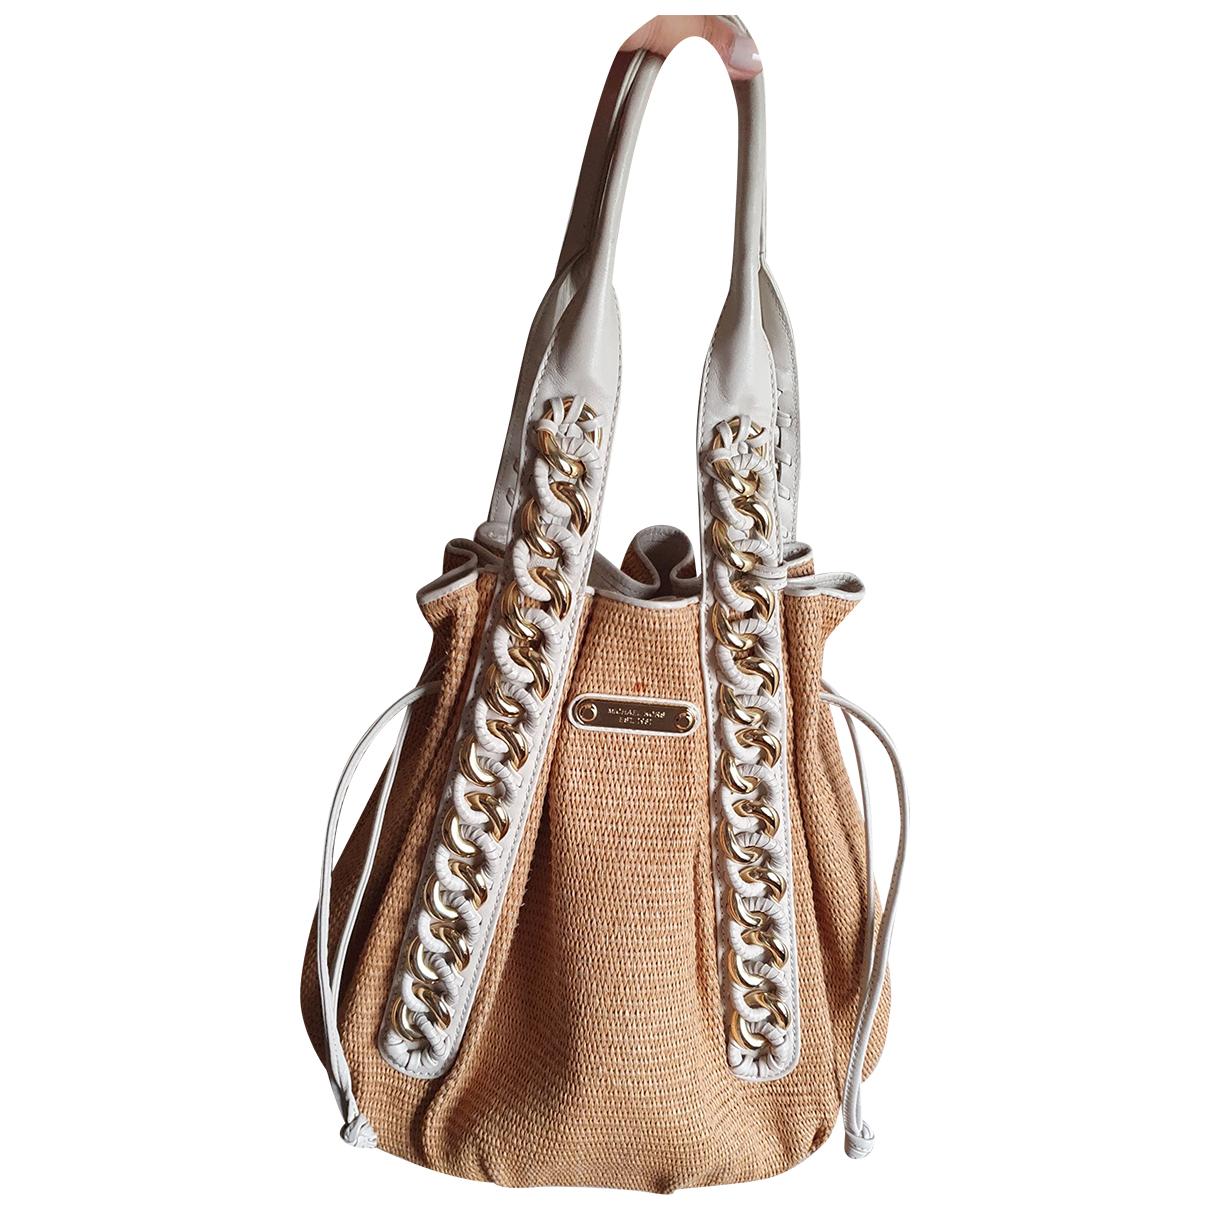 Michael Kors \N Beige Wicker handbag for Women \N